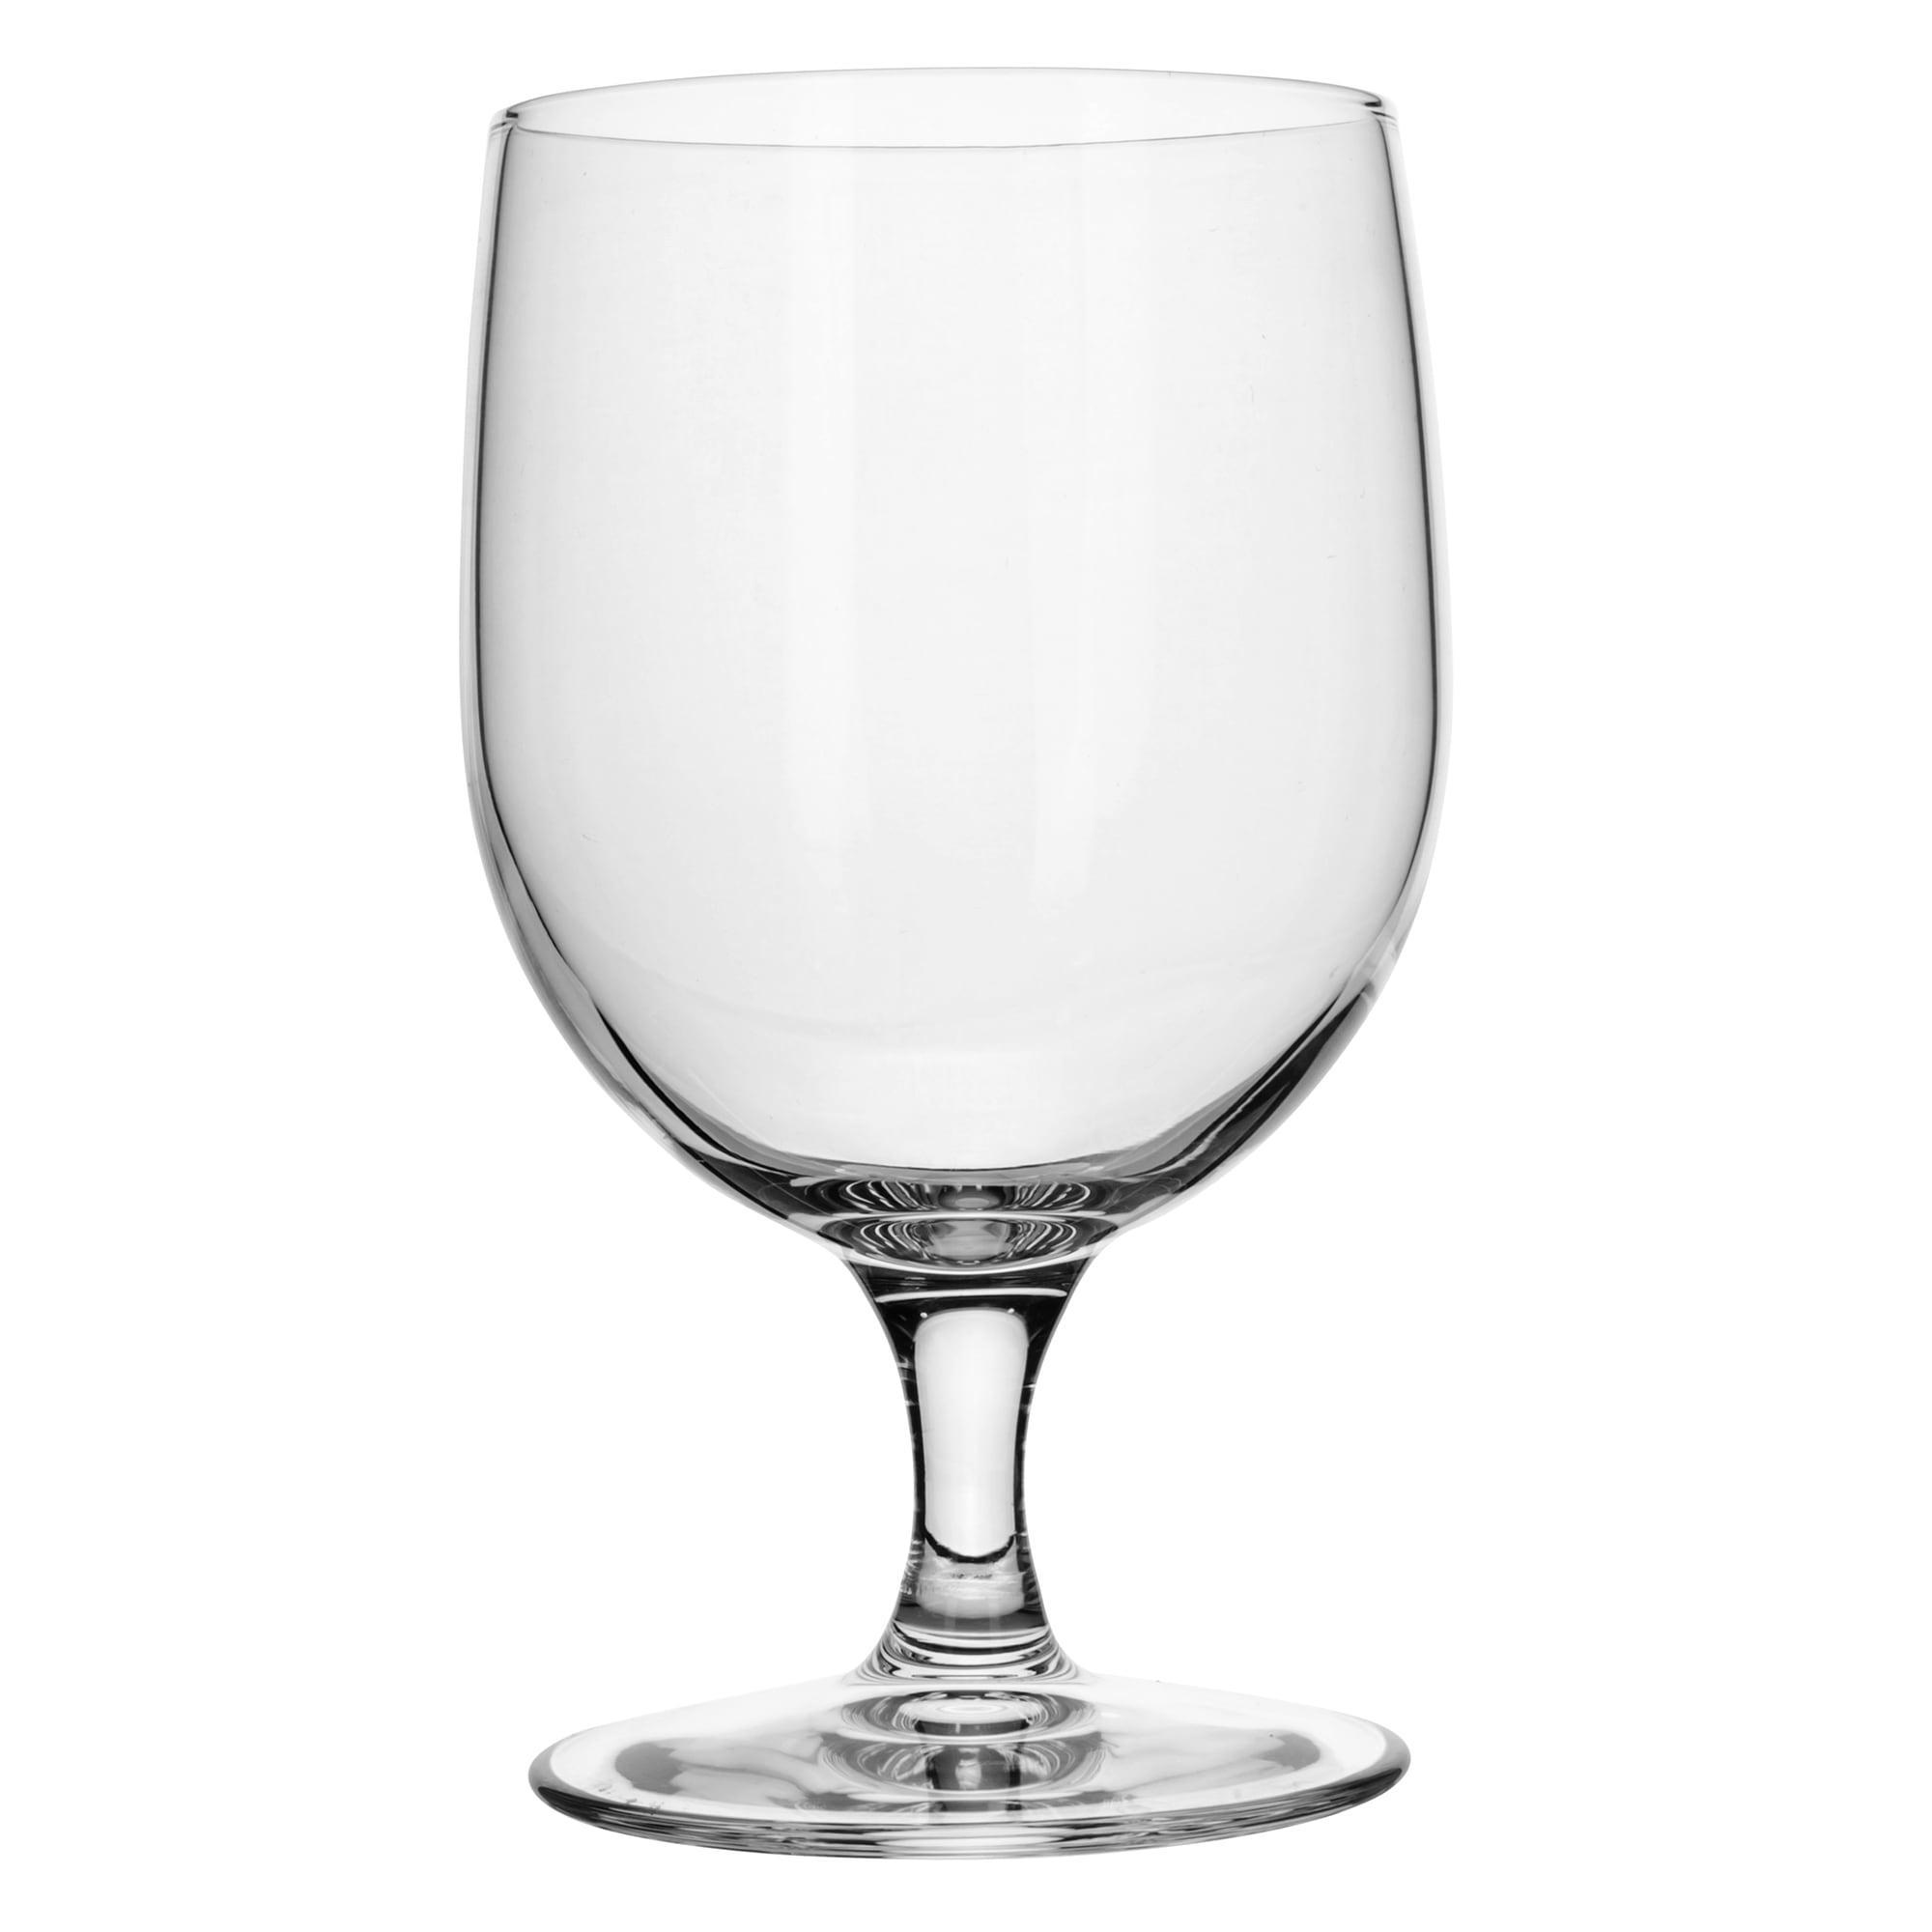 Libbey 8556SR 12 oz Bristol Valley Goblet Glass - Sheer Rim